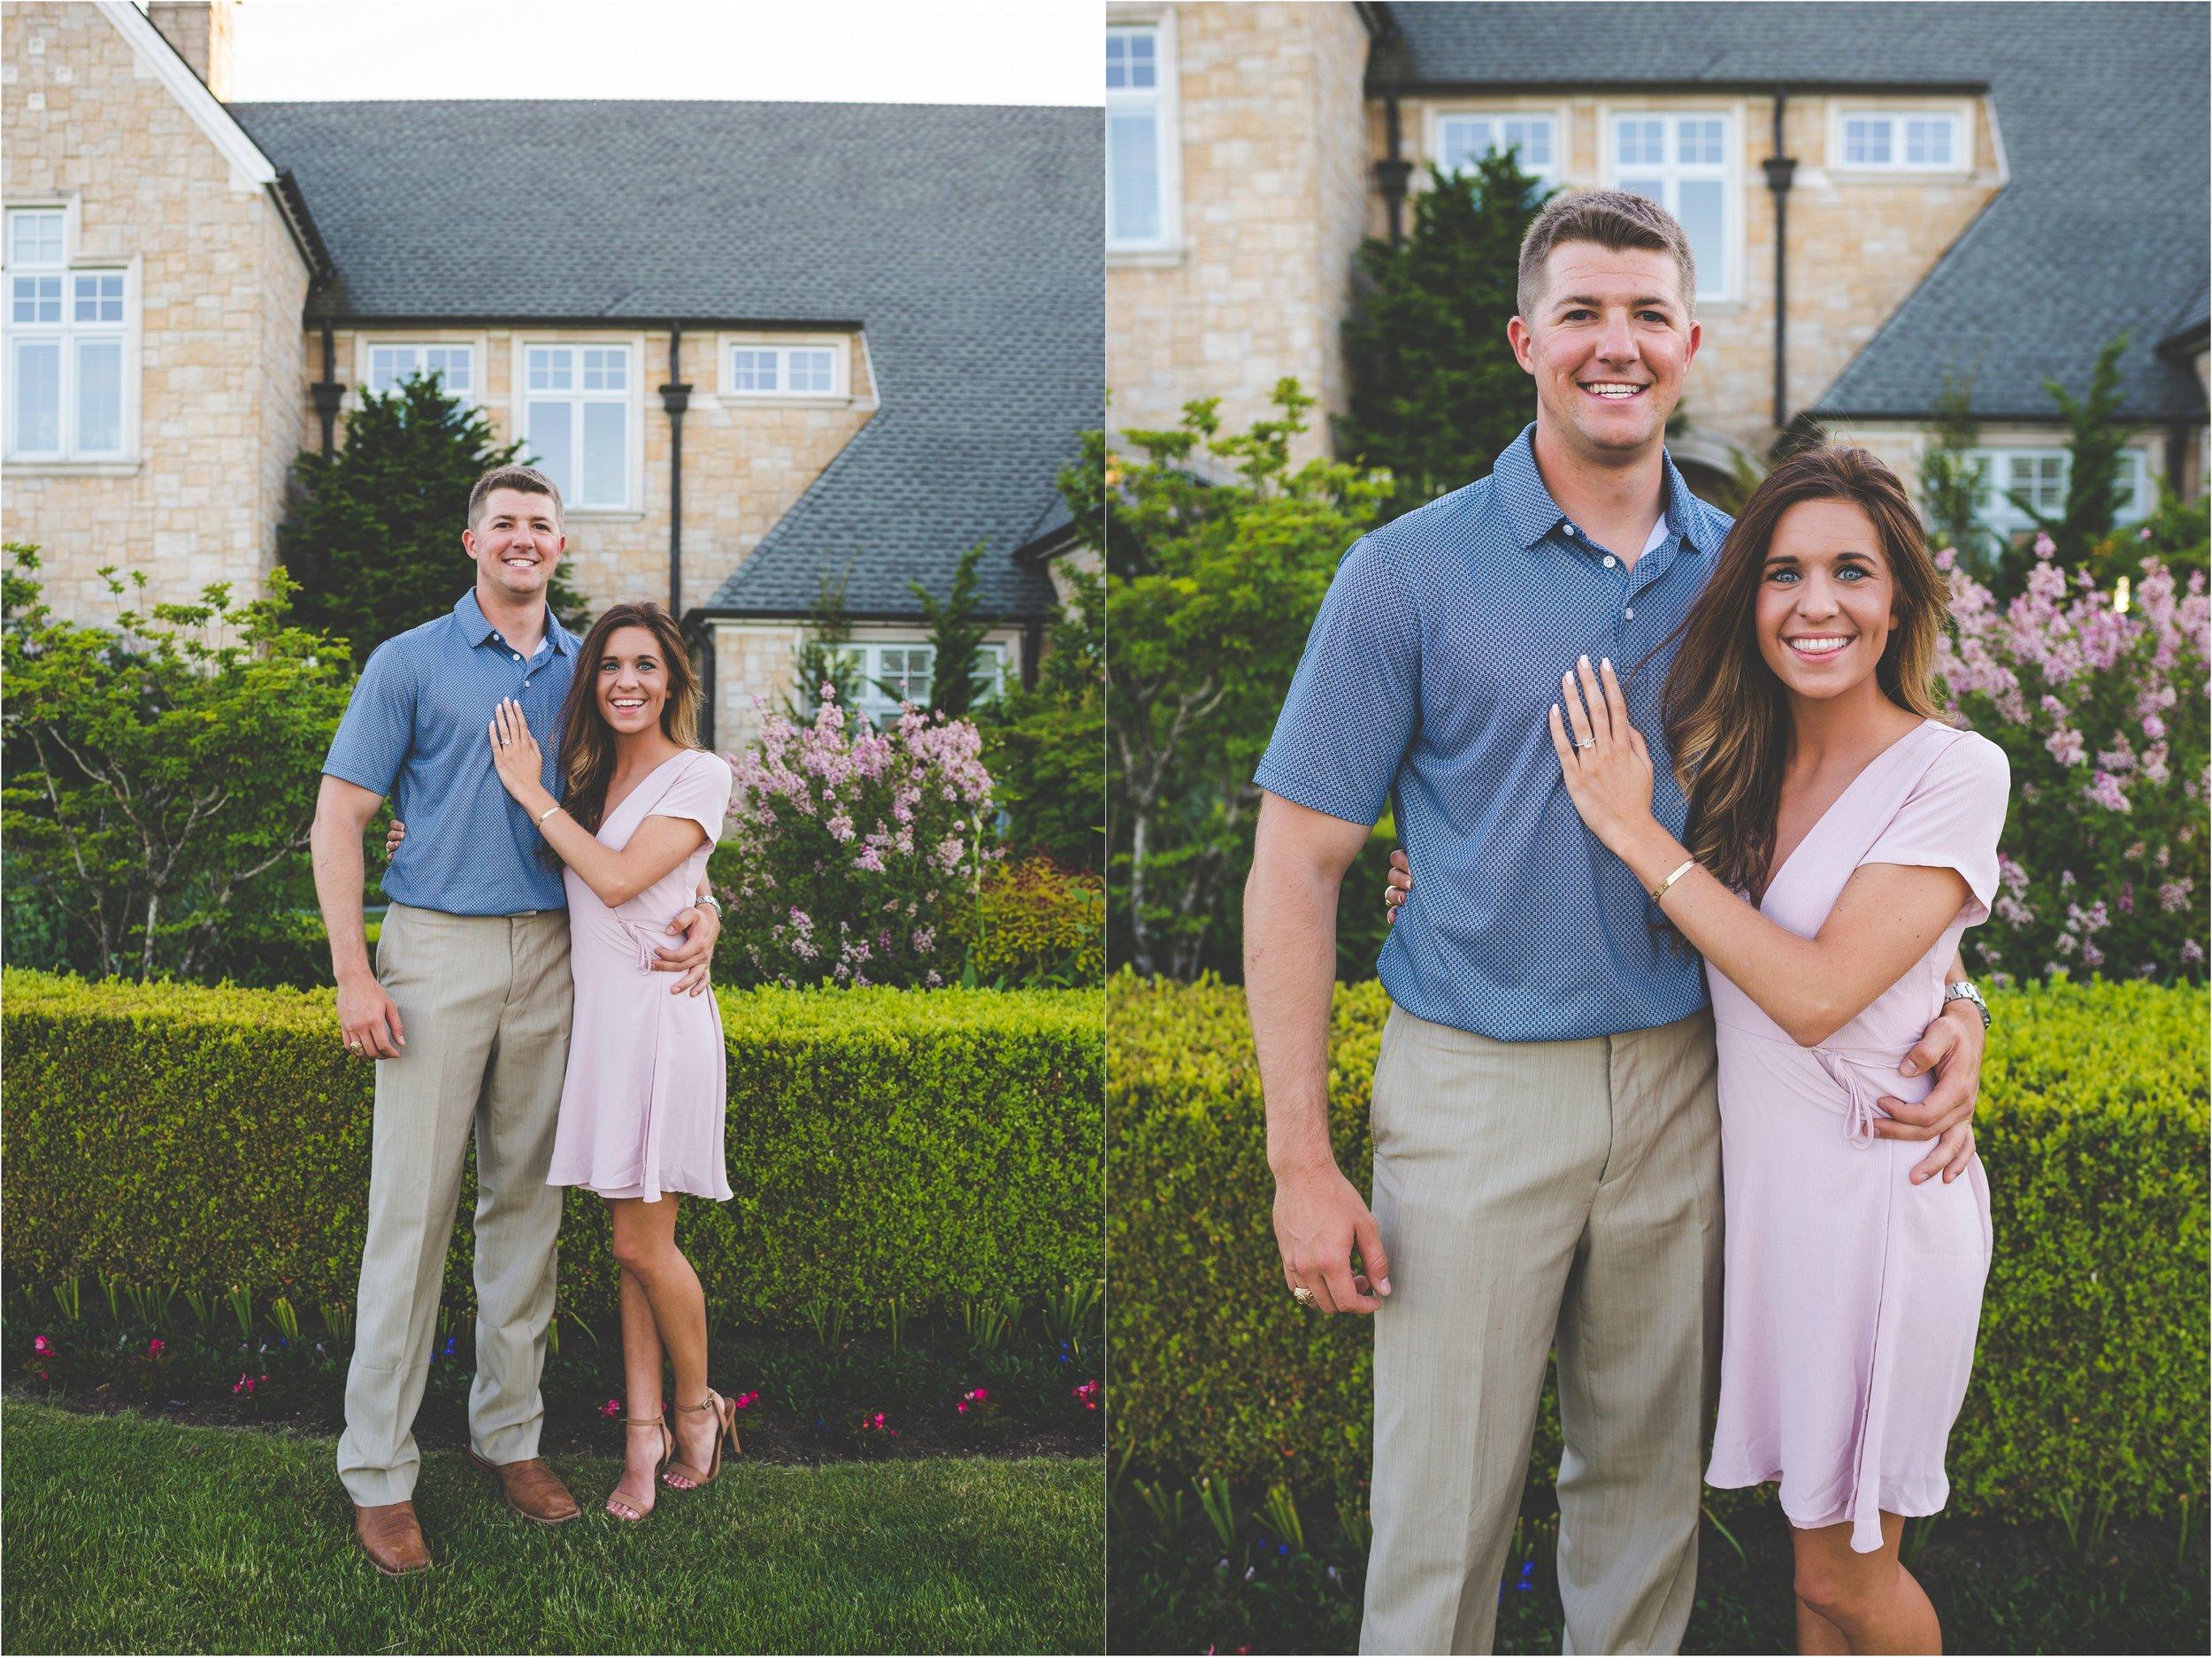 newcastle-golf-club-proposal-jannicka-mayte-seattle-washington-engagement-wedding-photographer_0040.jpg